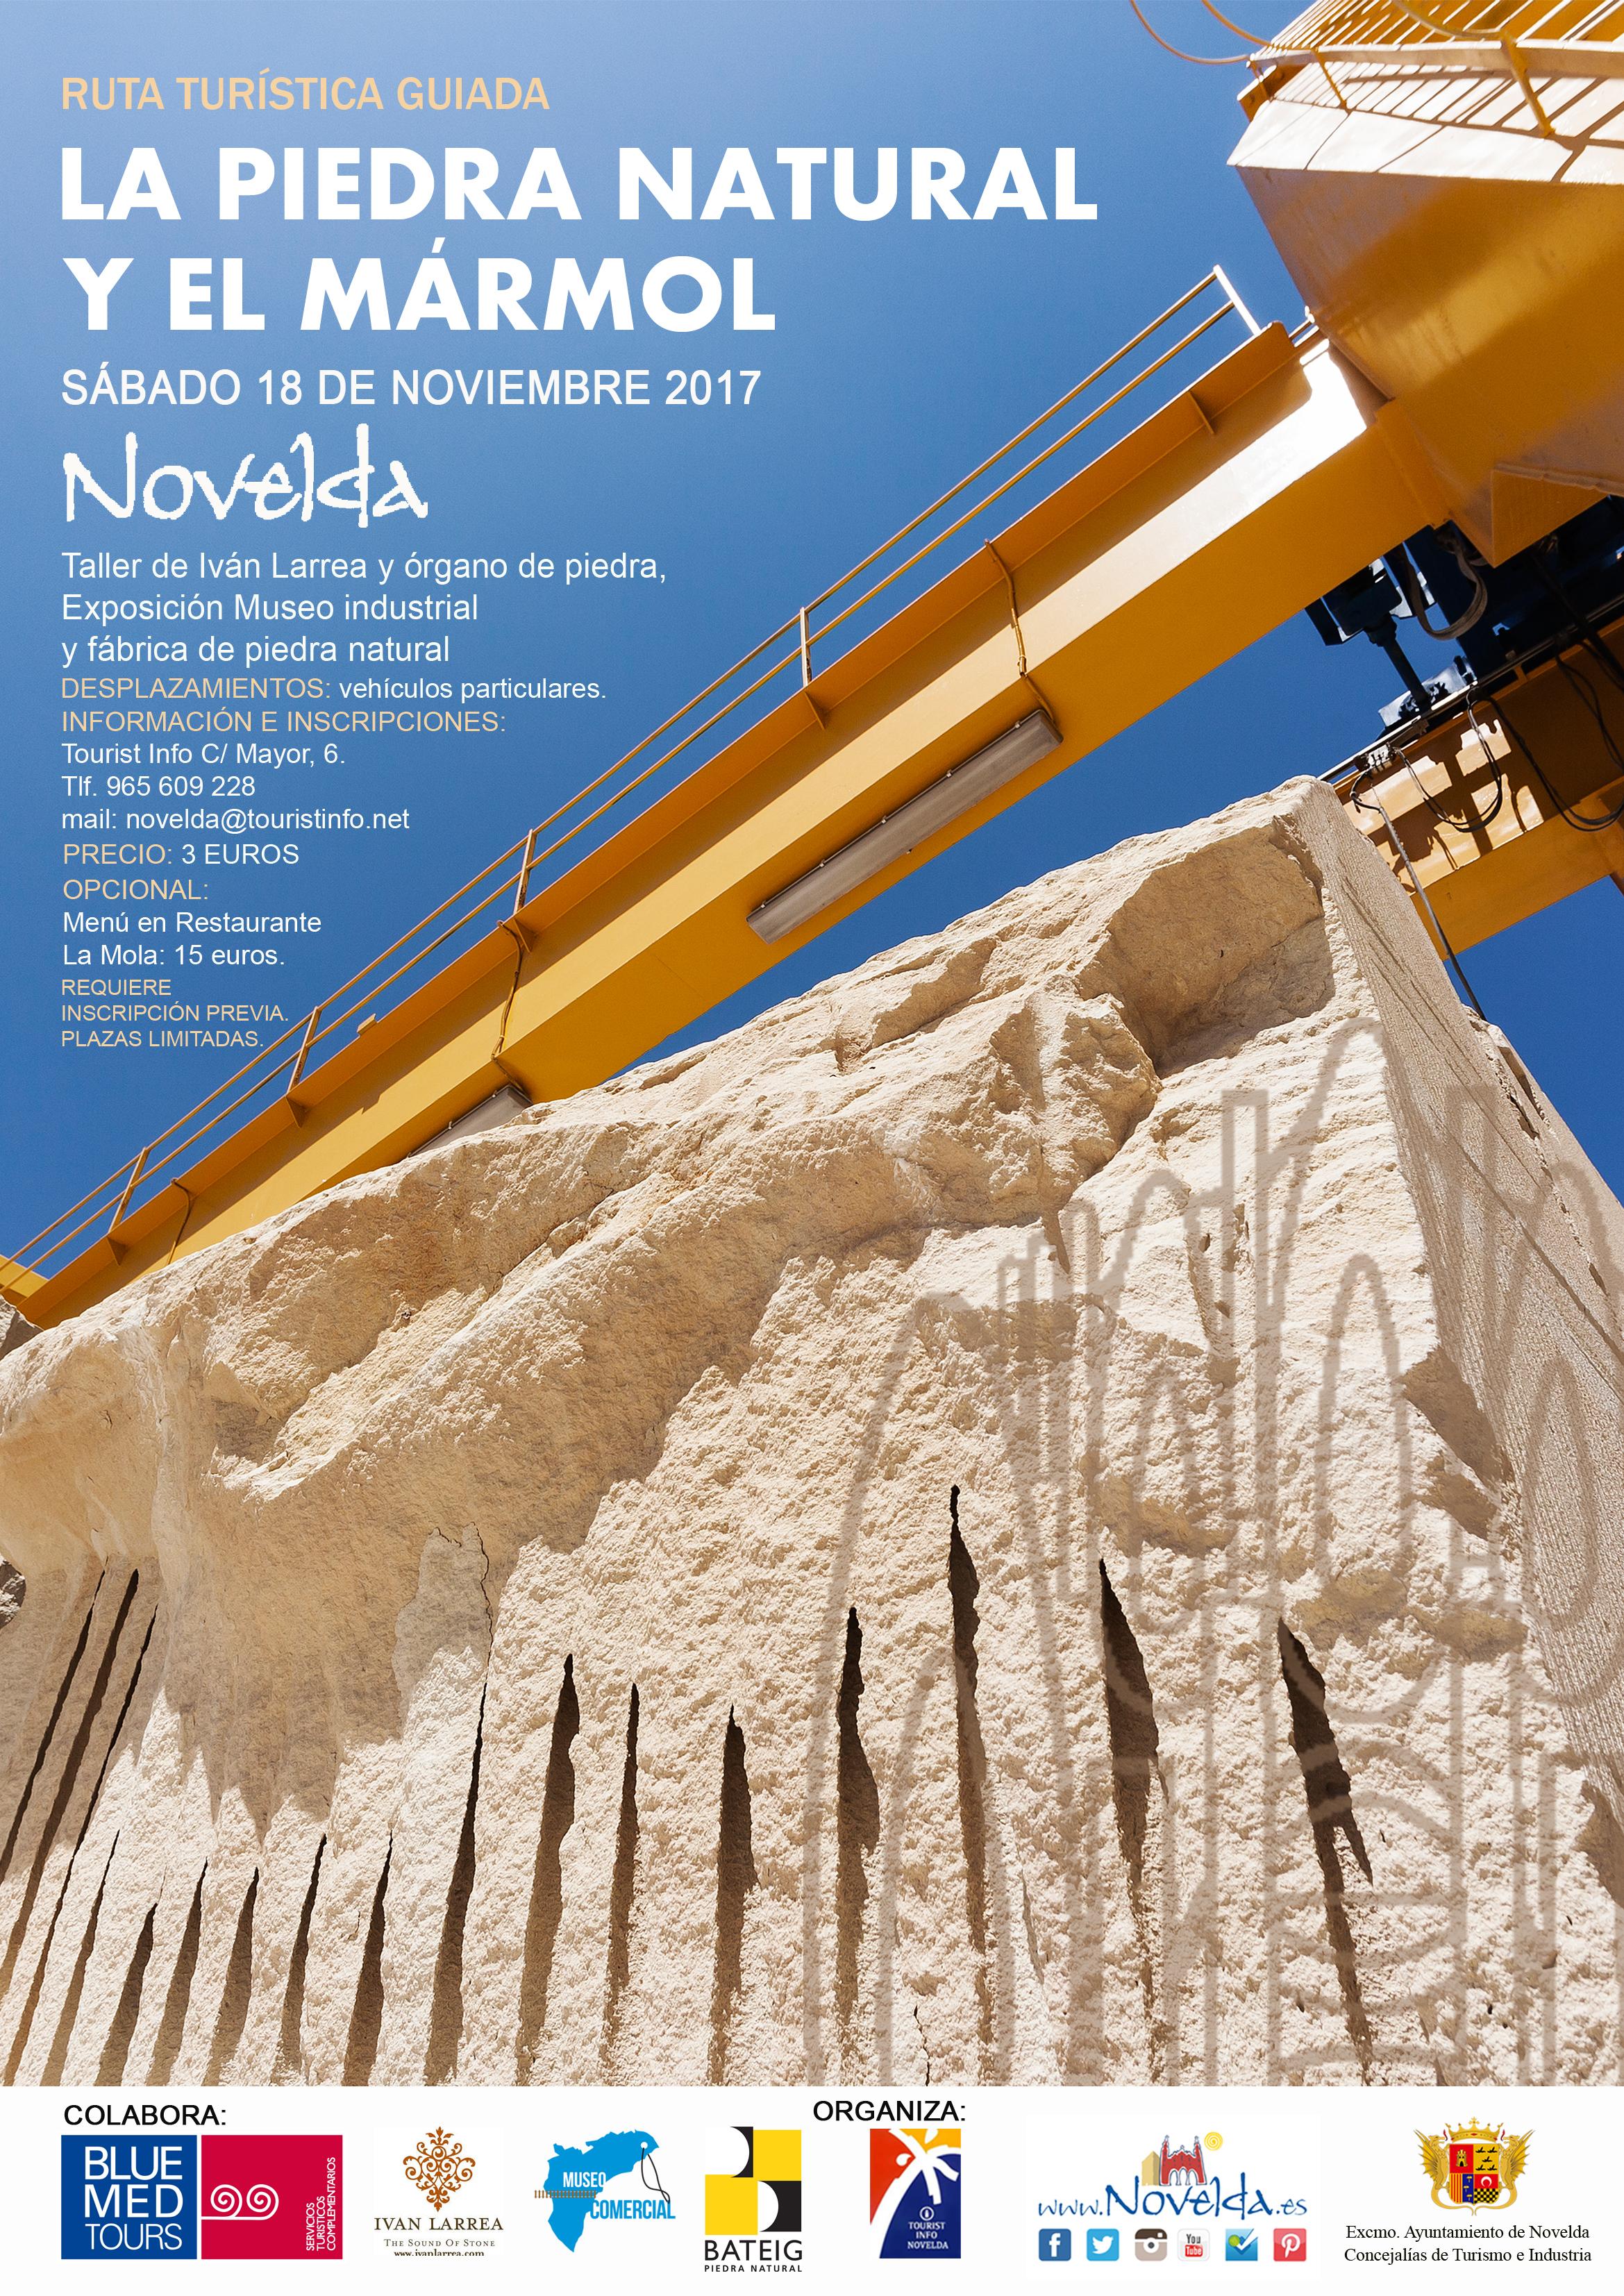 RUTA INDUSTRIAL Novelda 18 de noviembre 2017